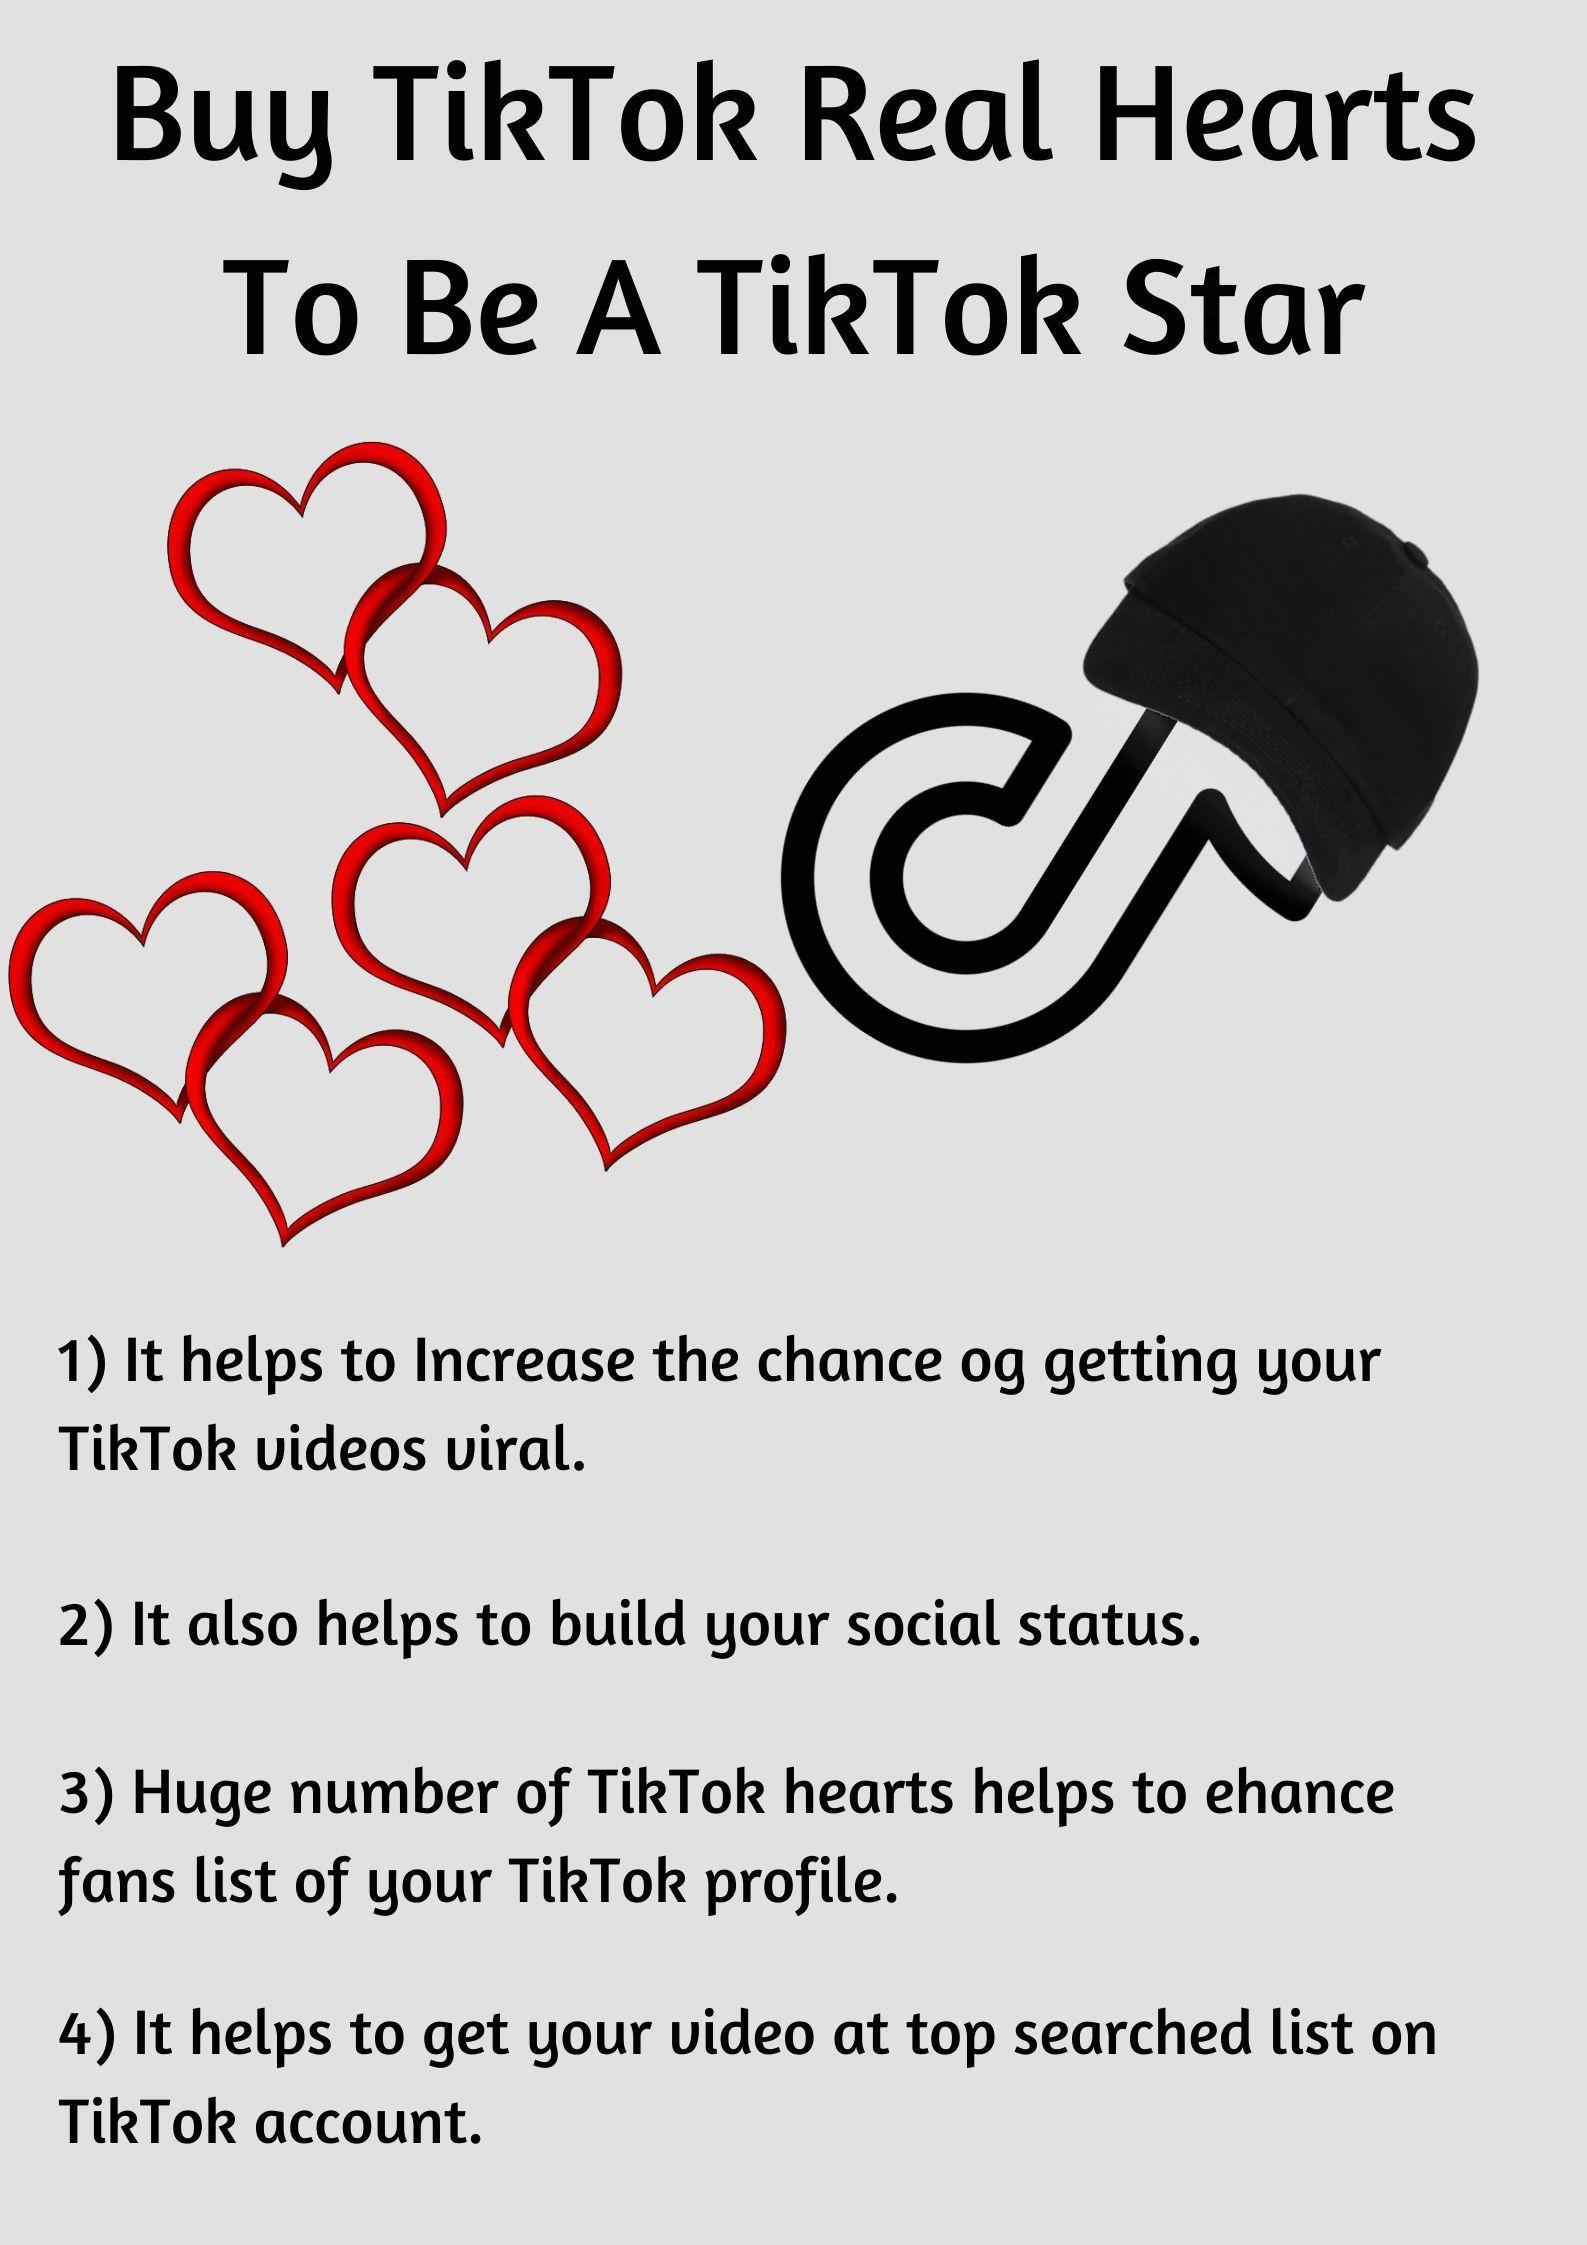 Buy Tiktok Real Hearts To Be A Tiktok Star Stuff To Buy Creative Abilities Real